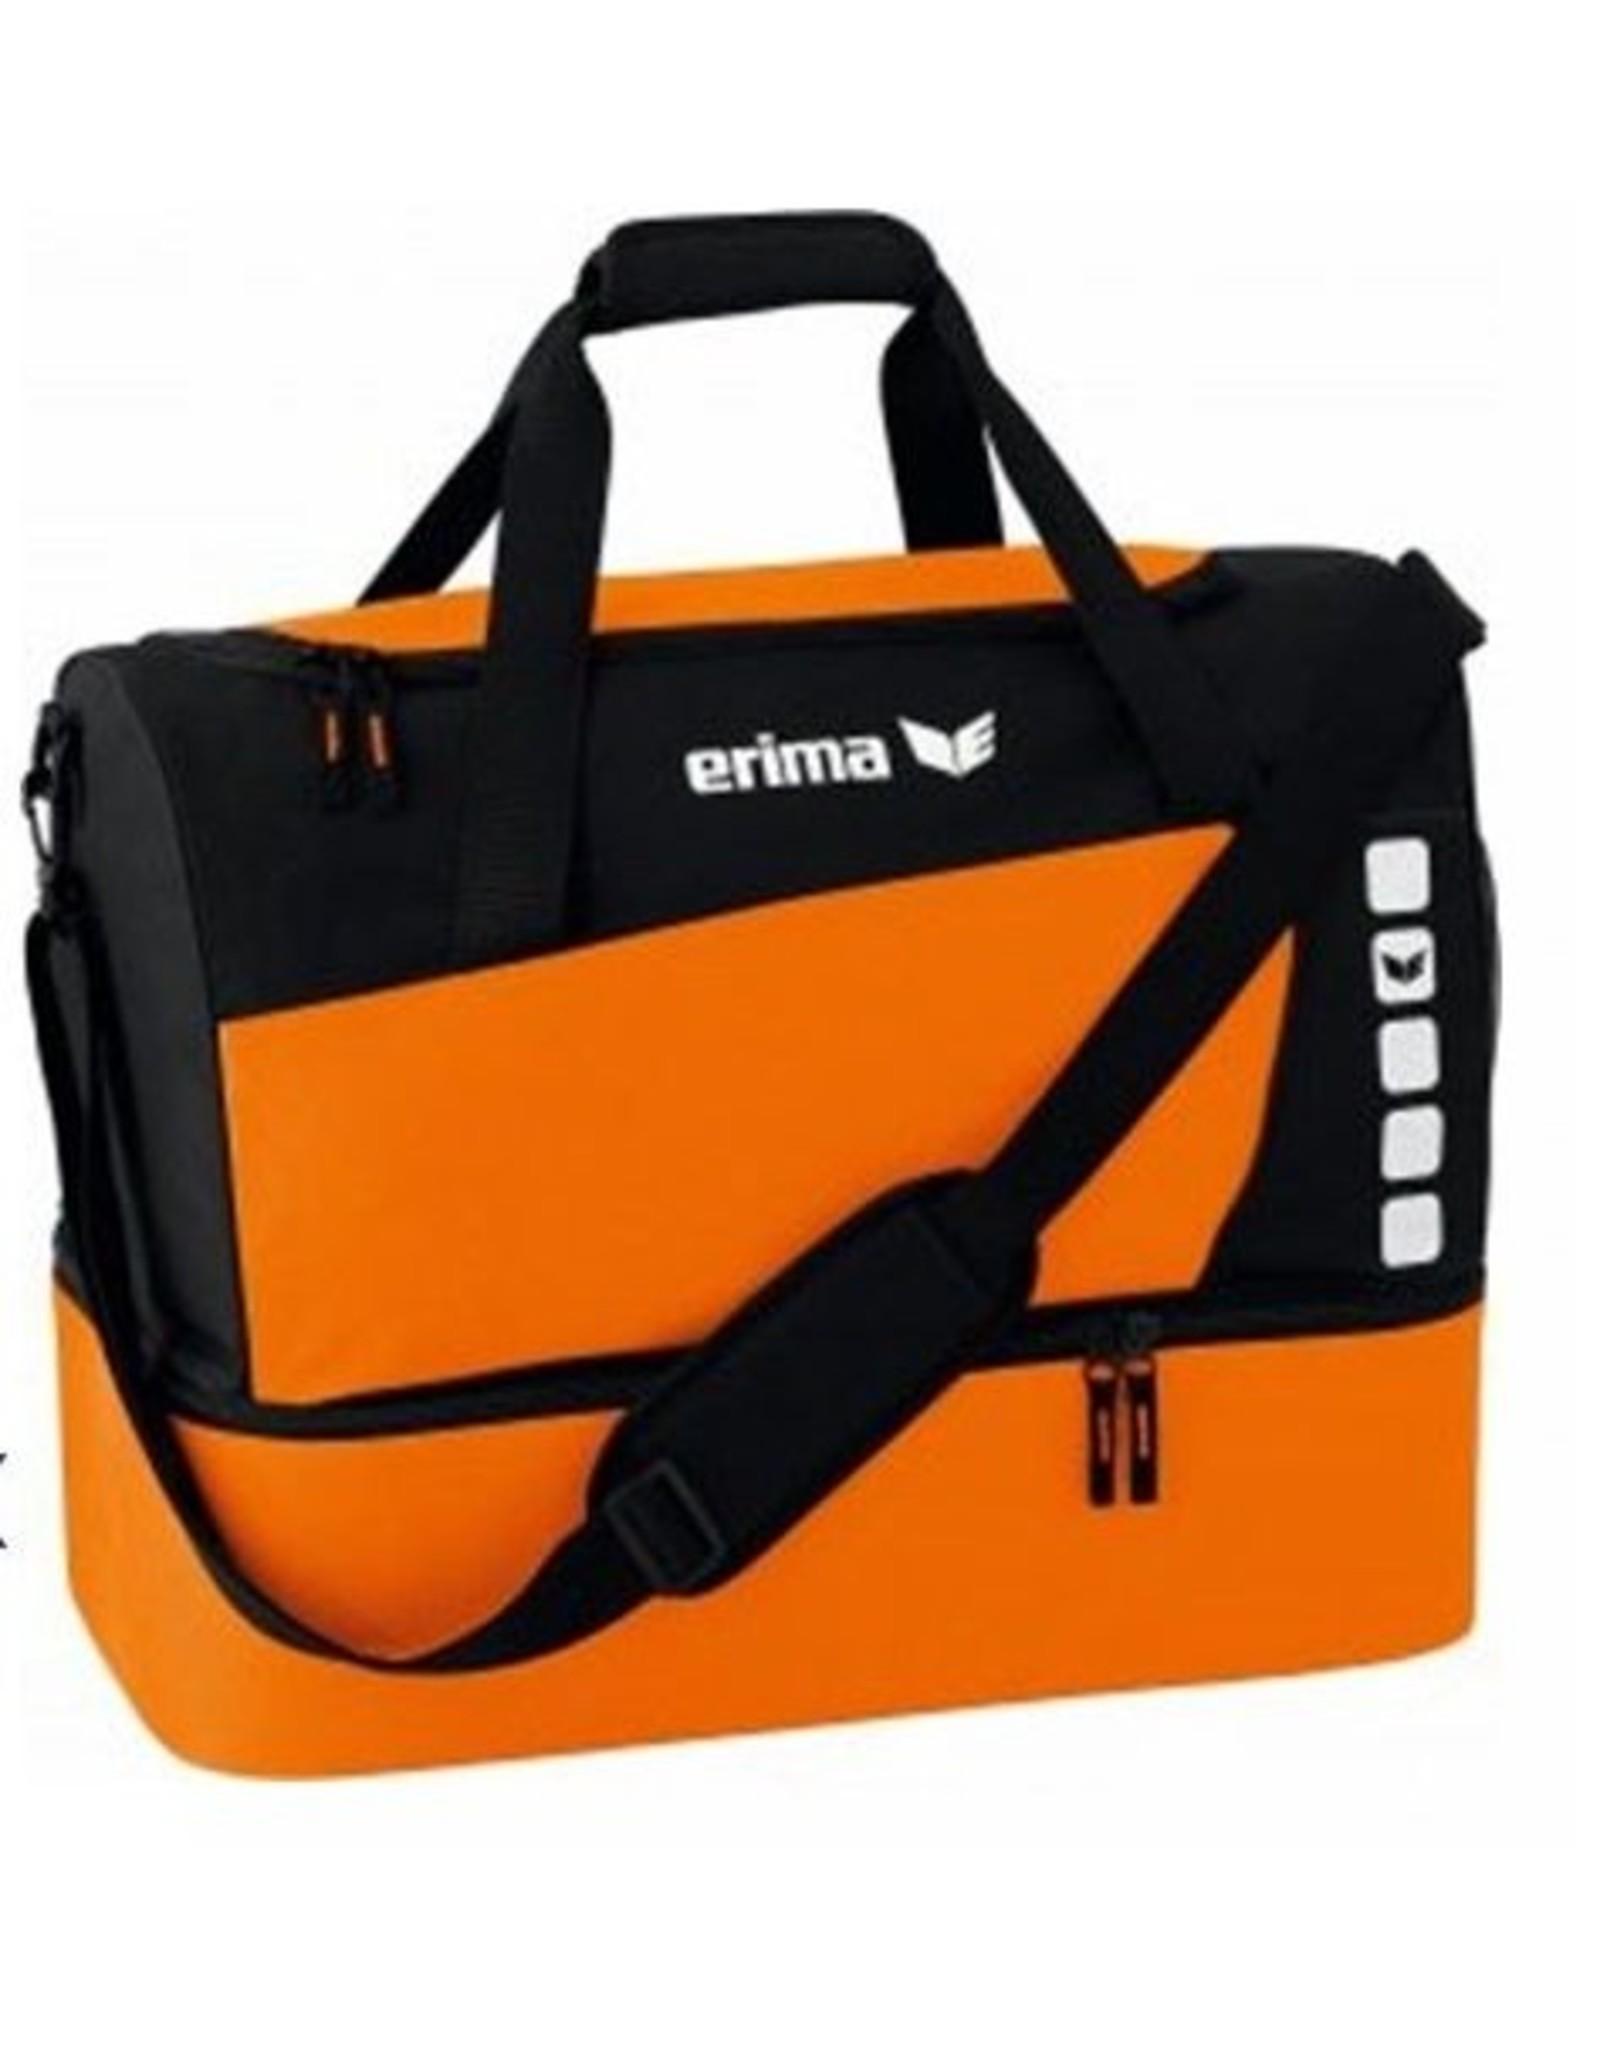 Erima Oranje Blauw'15 sporttas met vak